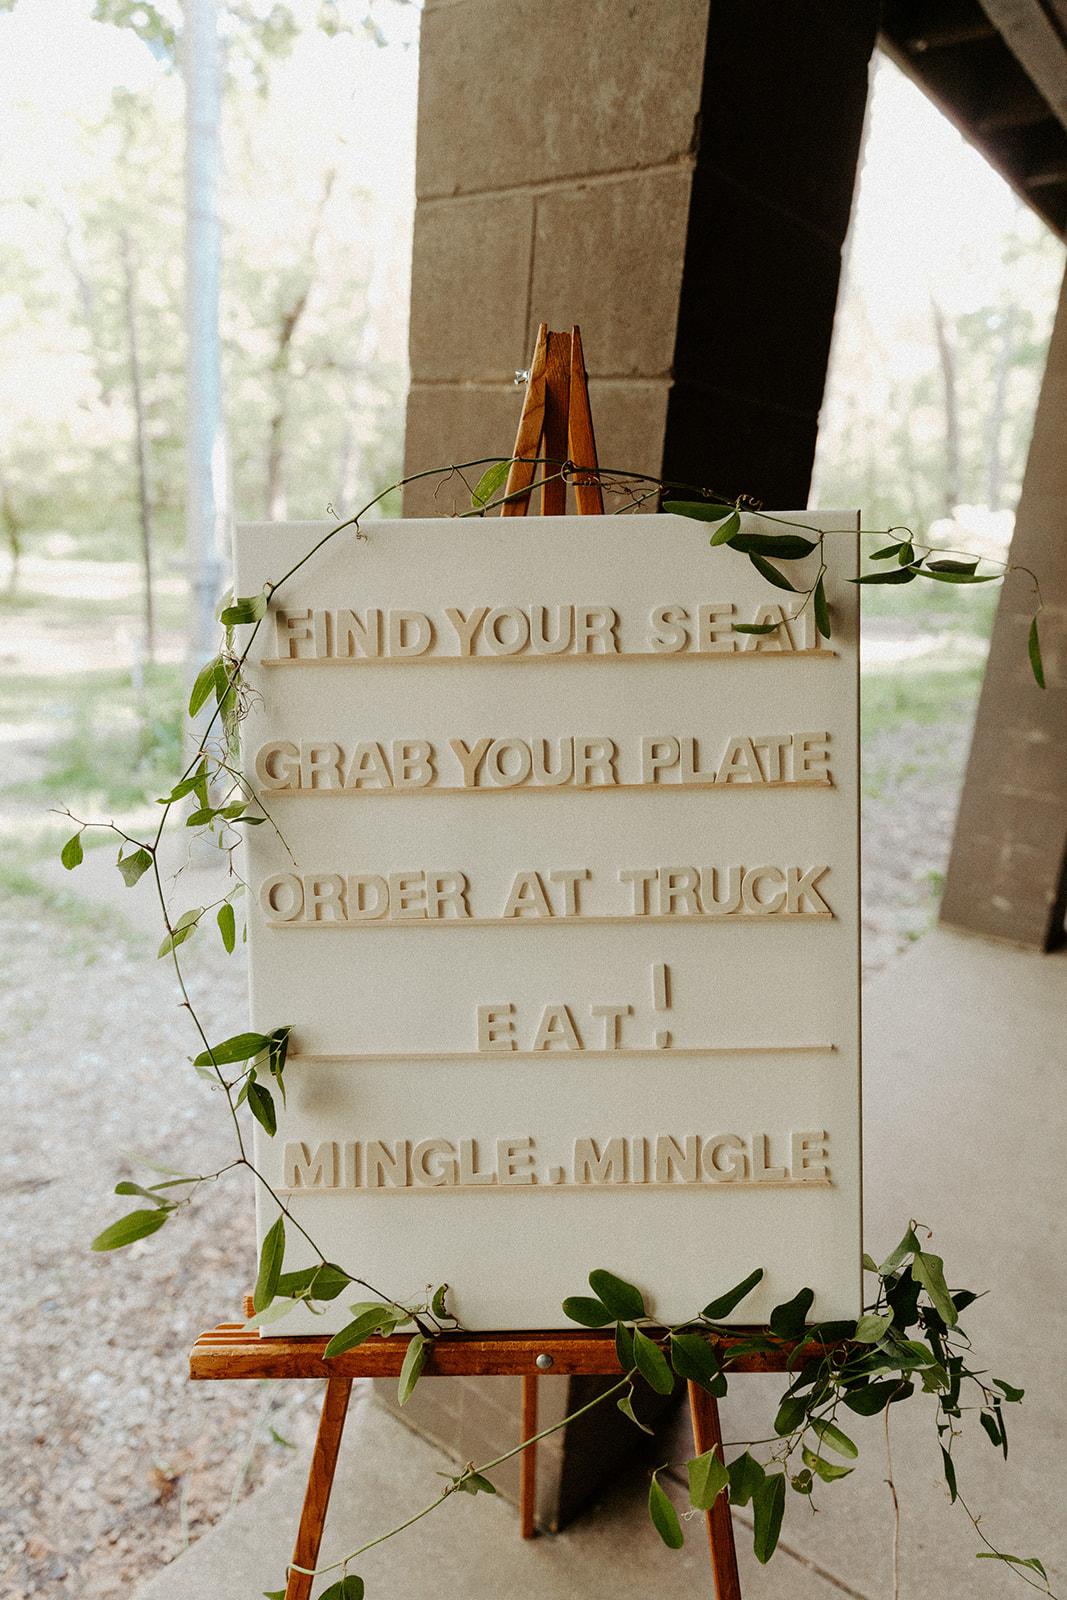 camp_wokanda_peoria_illinois_wedding_photographer_wright_photographs_bliese_0844.jpg